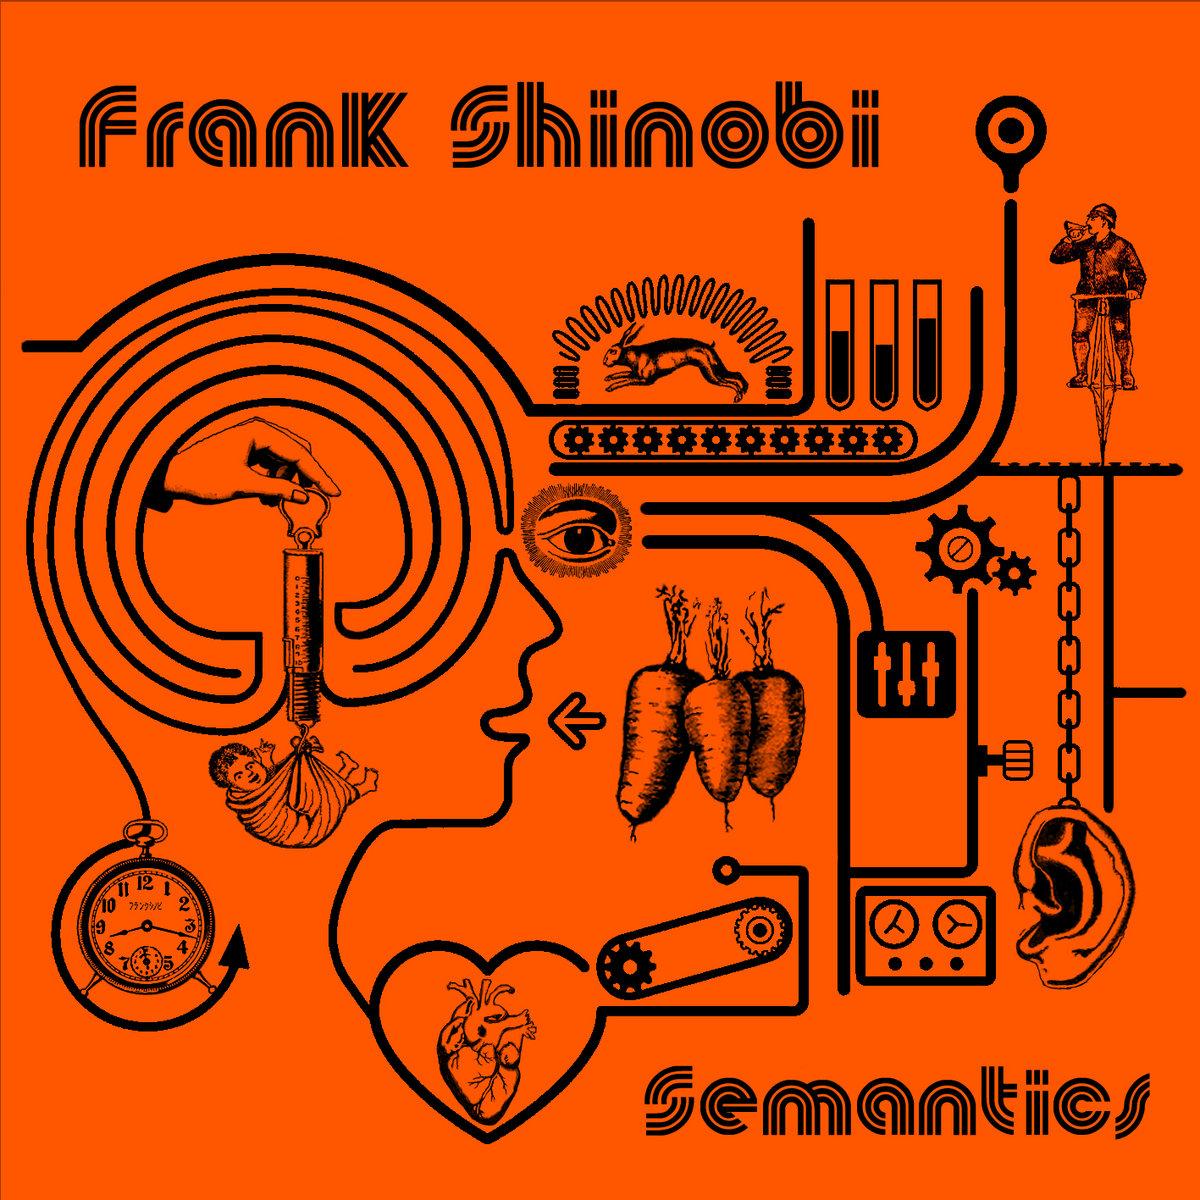 Frank Shinobi - indie rock